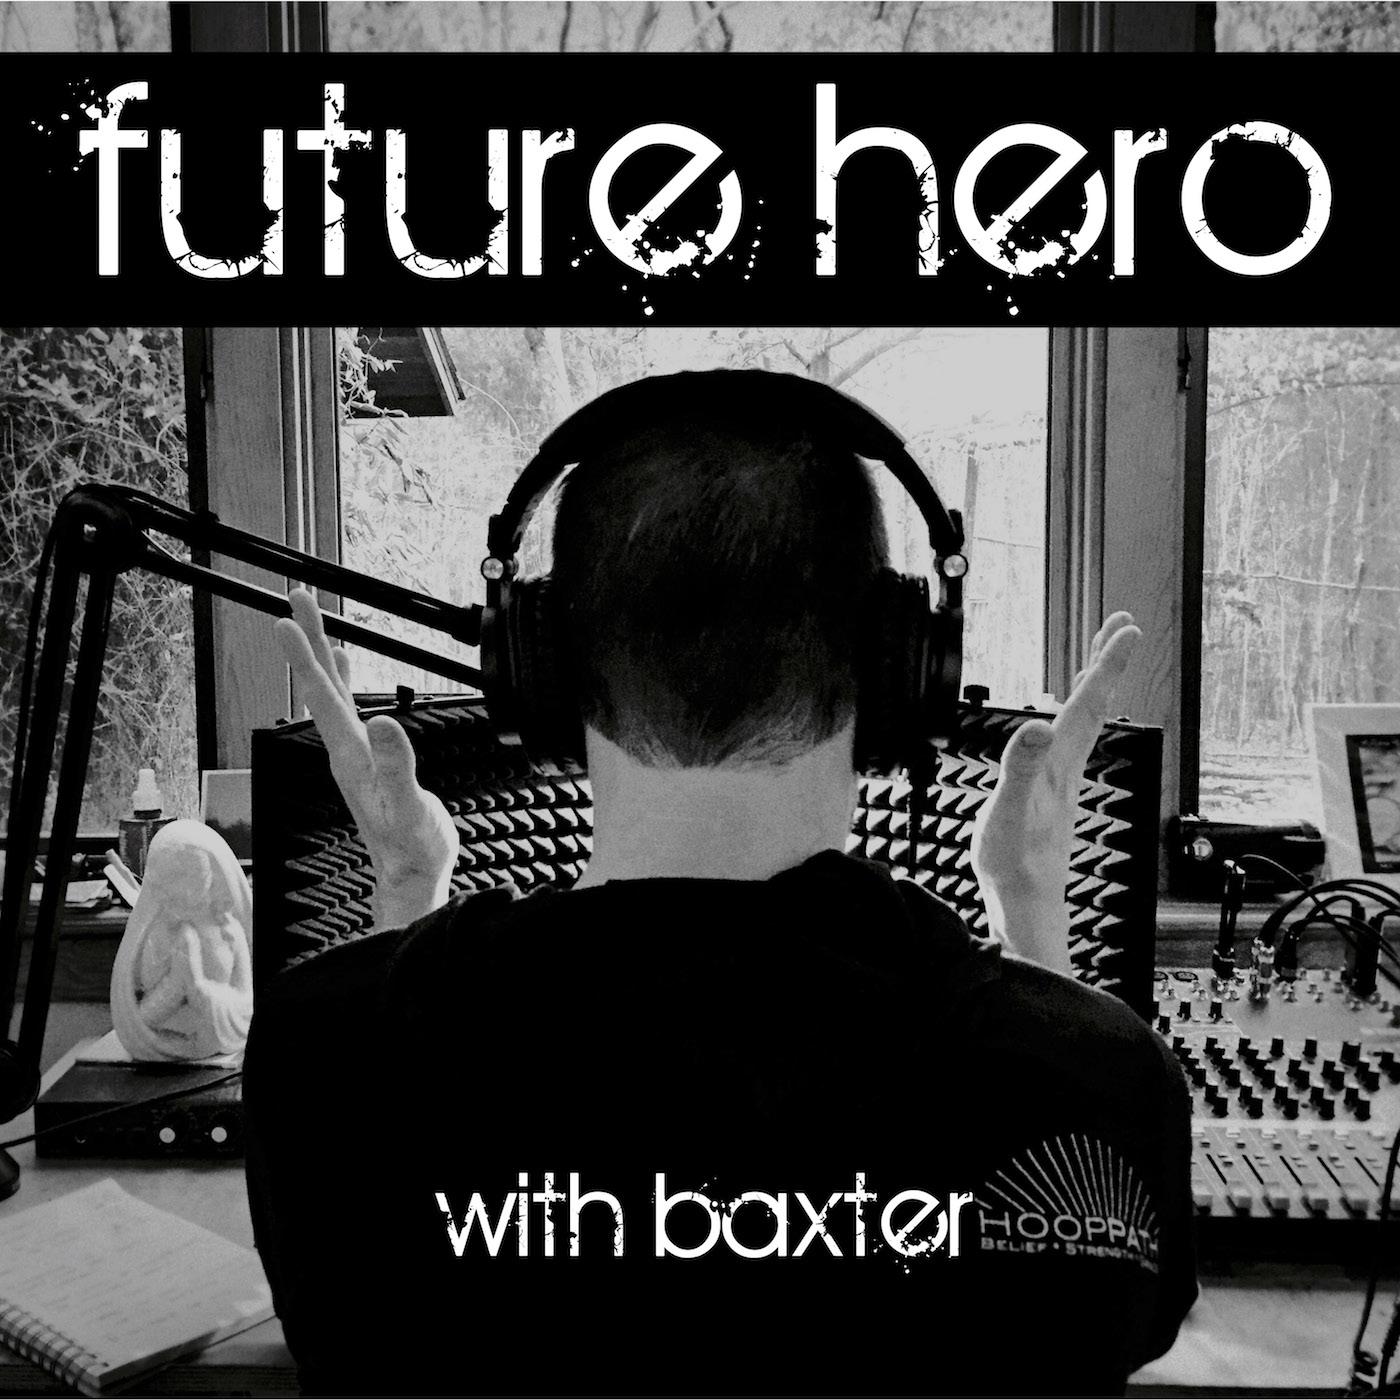 1400x 1400 baxter podcast.jpeg